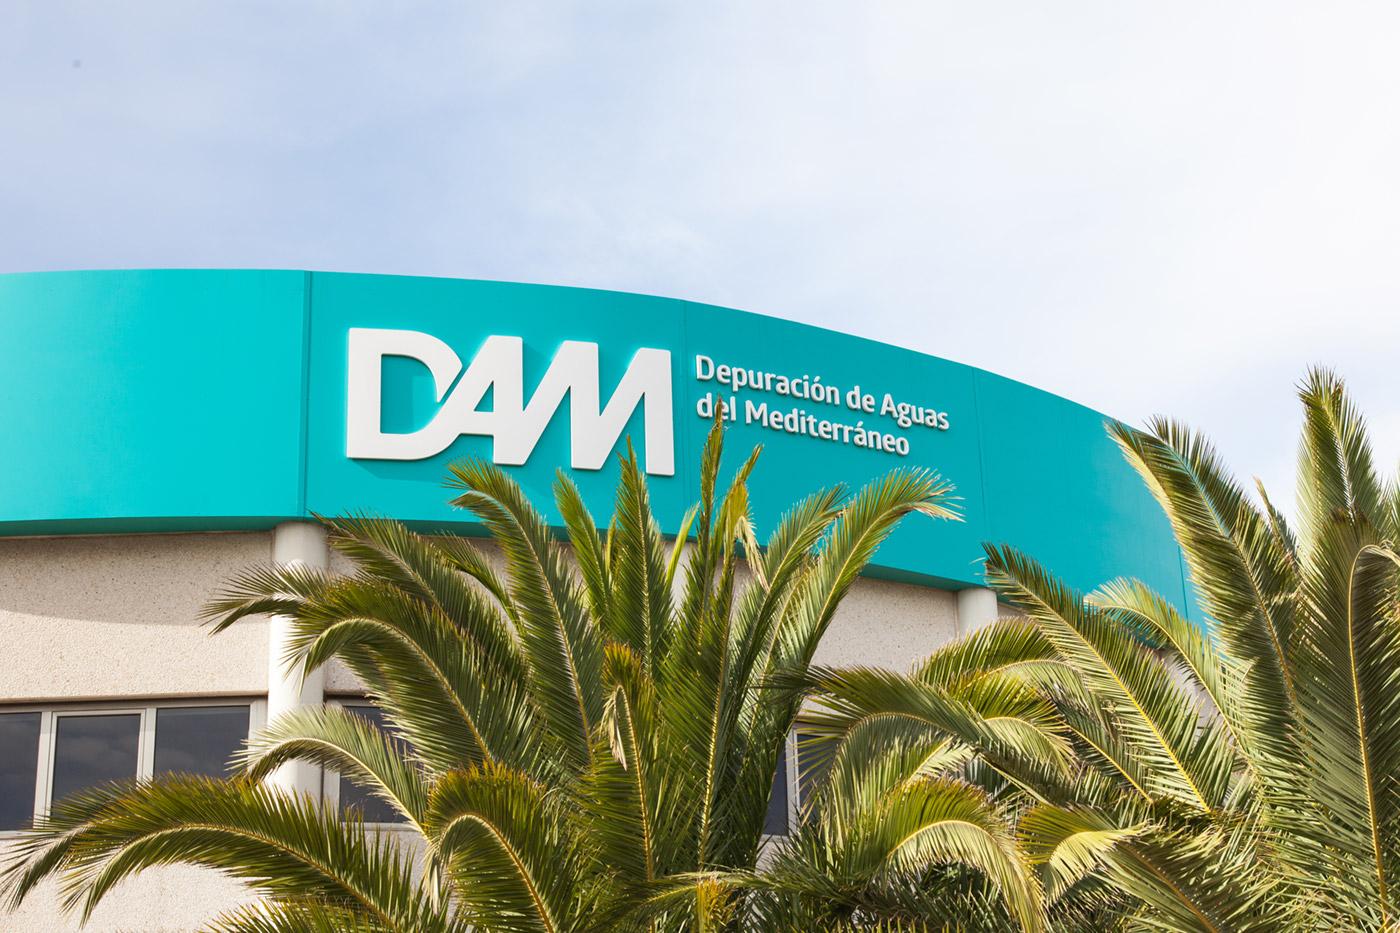 pixelarte-diseno-grafico-rotulacion-industrial-Dam_Depuracion_Aguas_Mediterraneo